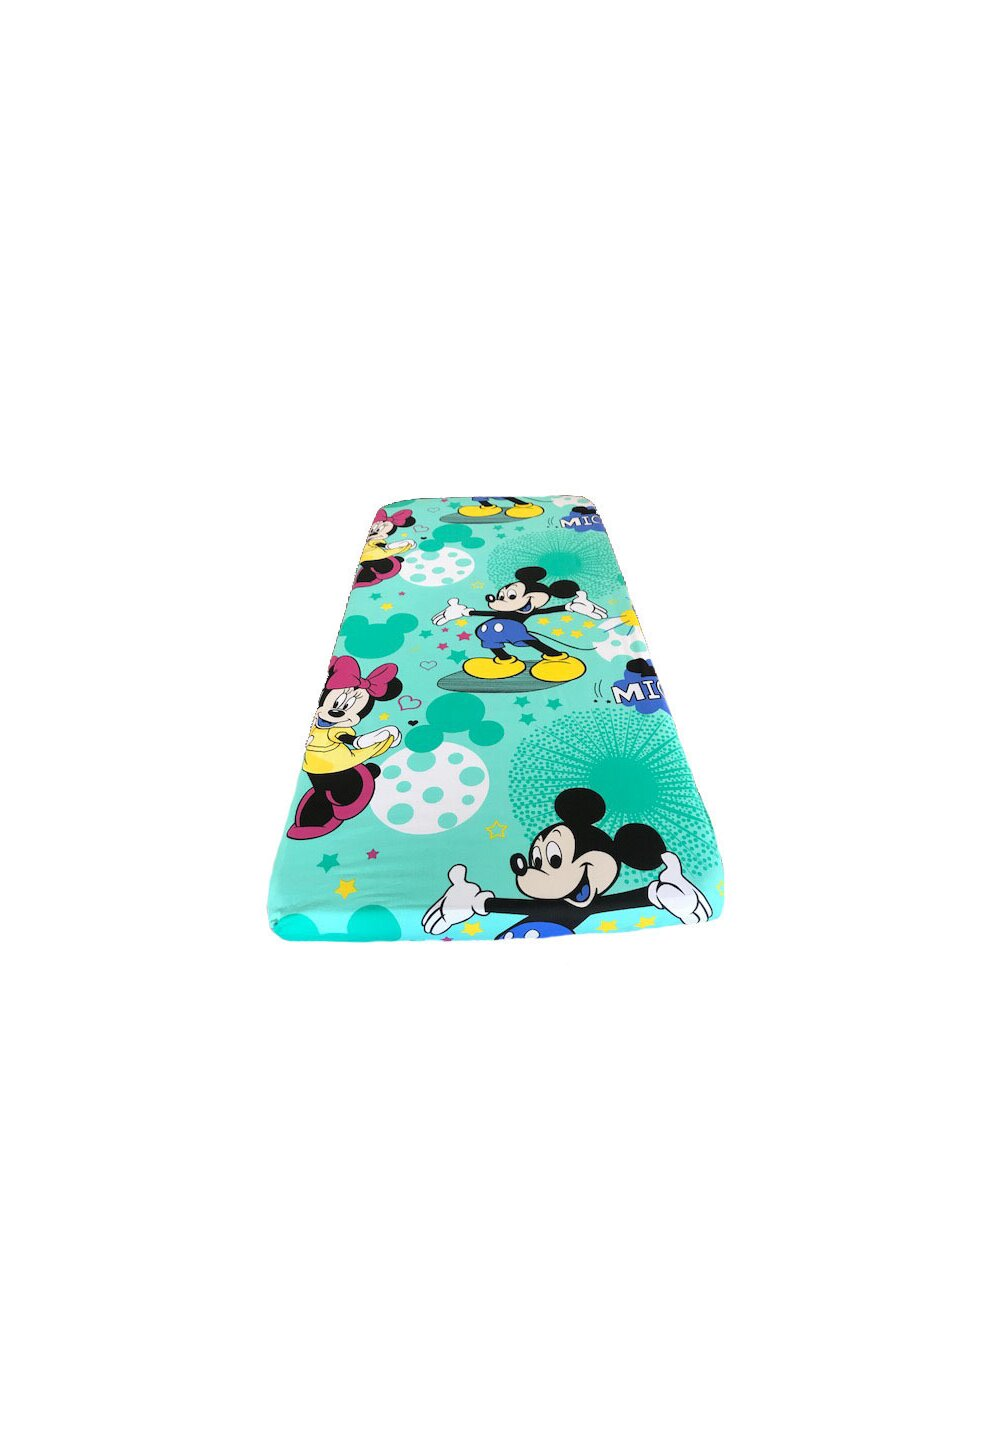 Cearceaf Piccolo, Minnie si Mickey turcoaz, 90x40cm imagine